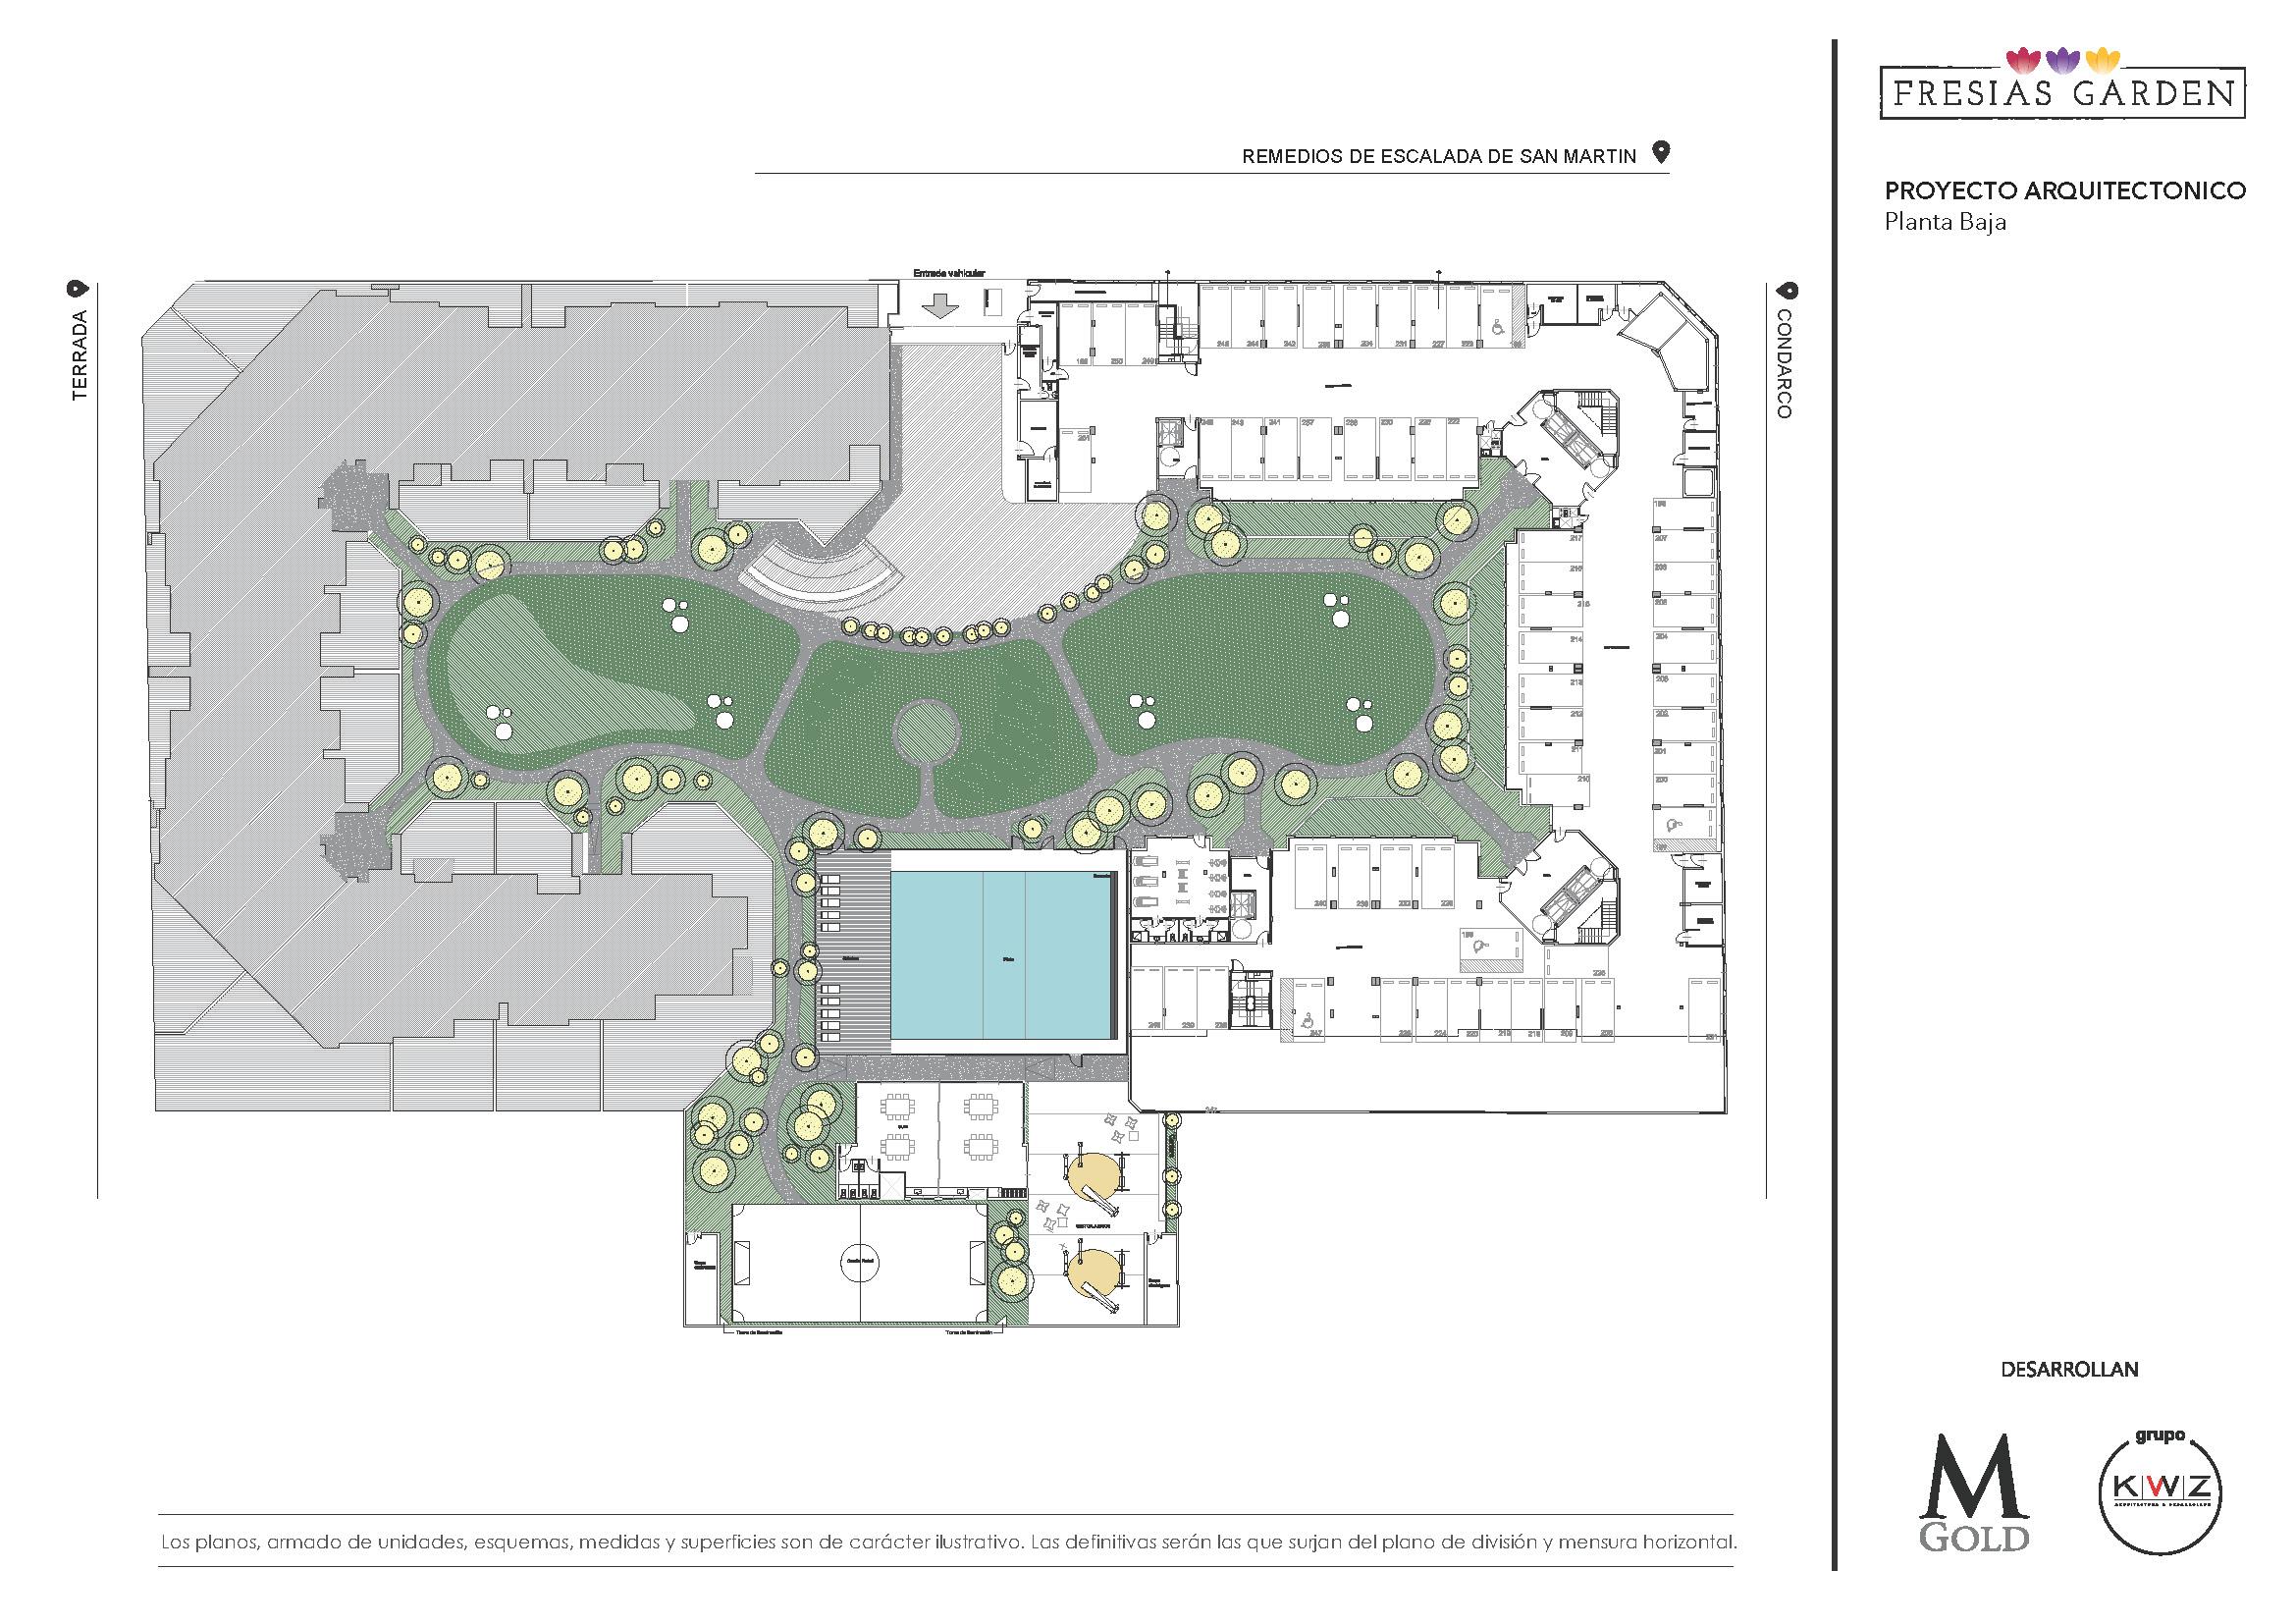 Fresias Garden - Plantas Generales_Page_1.jpg